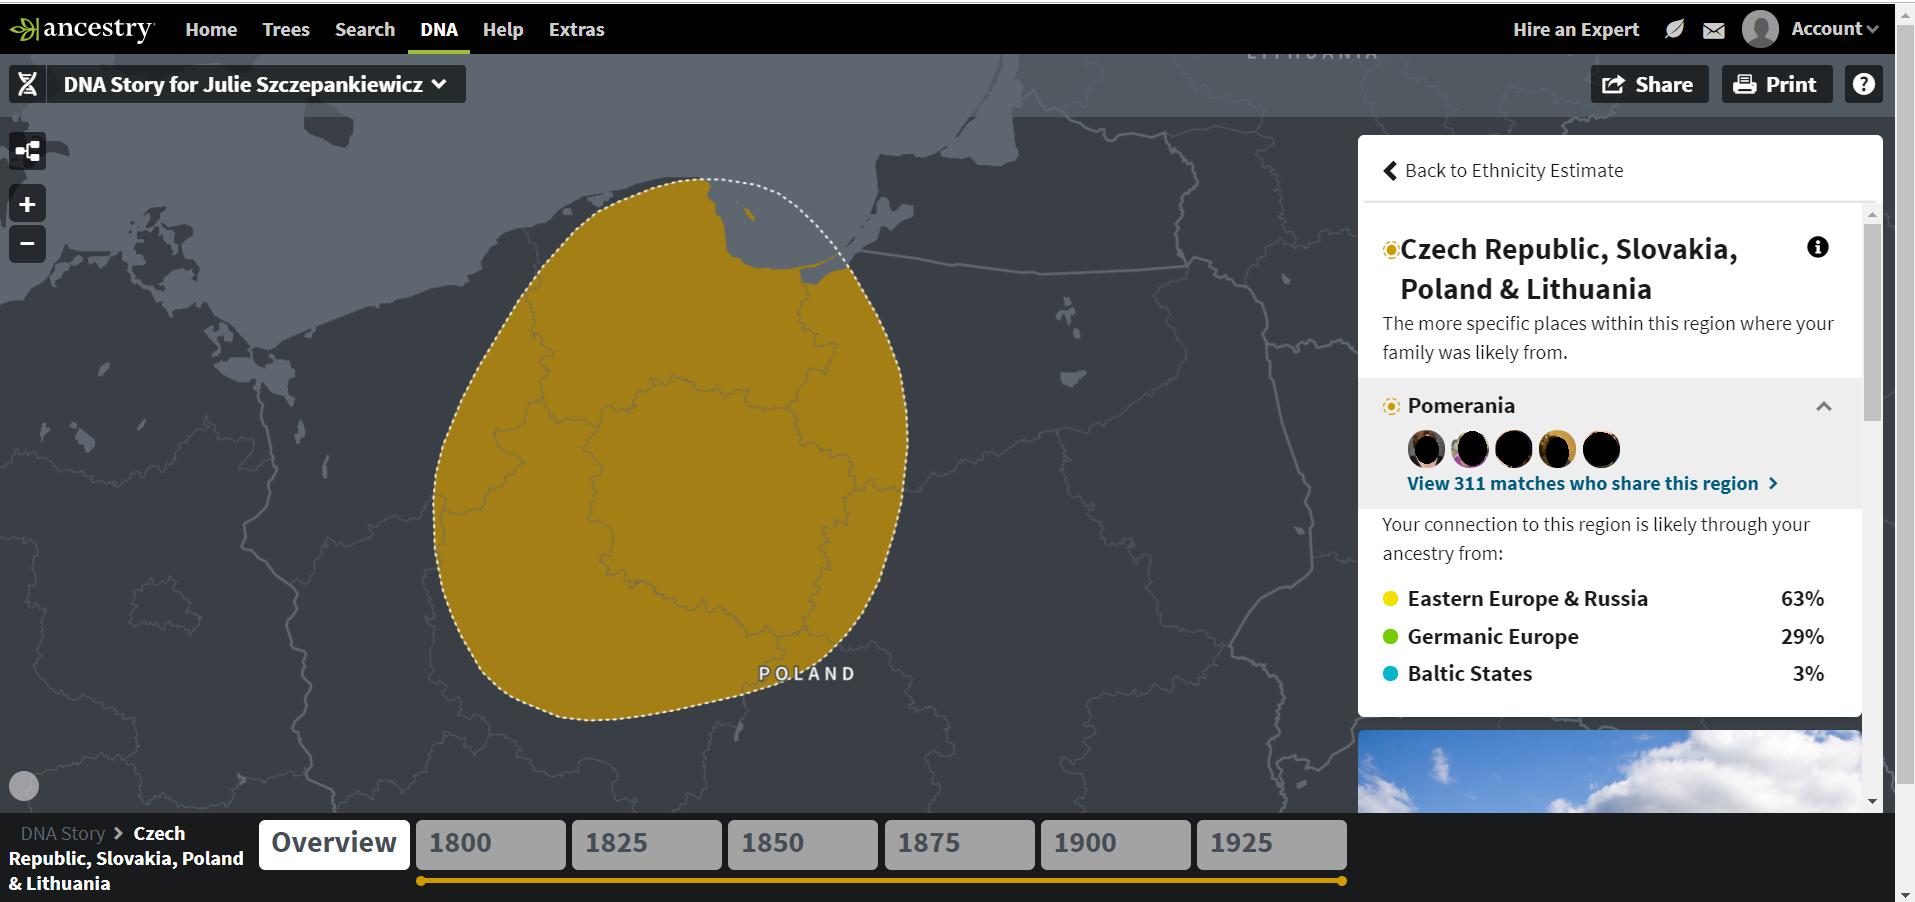 Ancestry DNA Pomerania